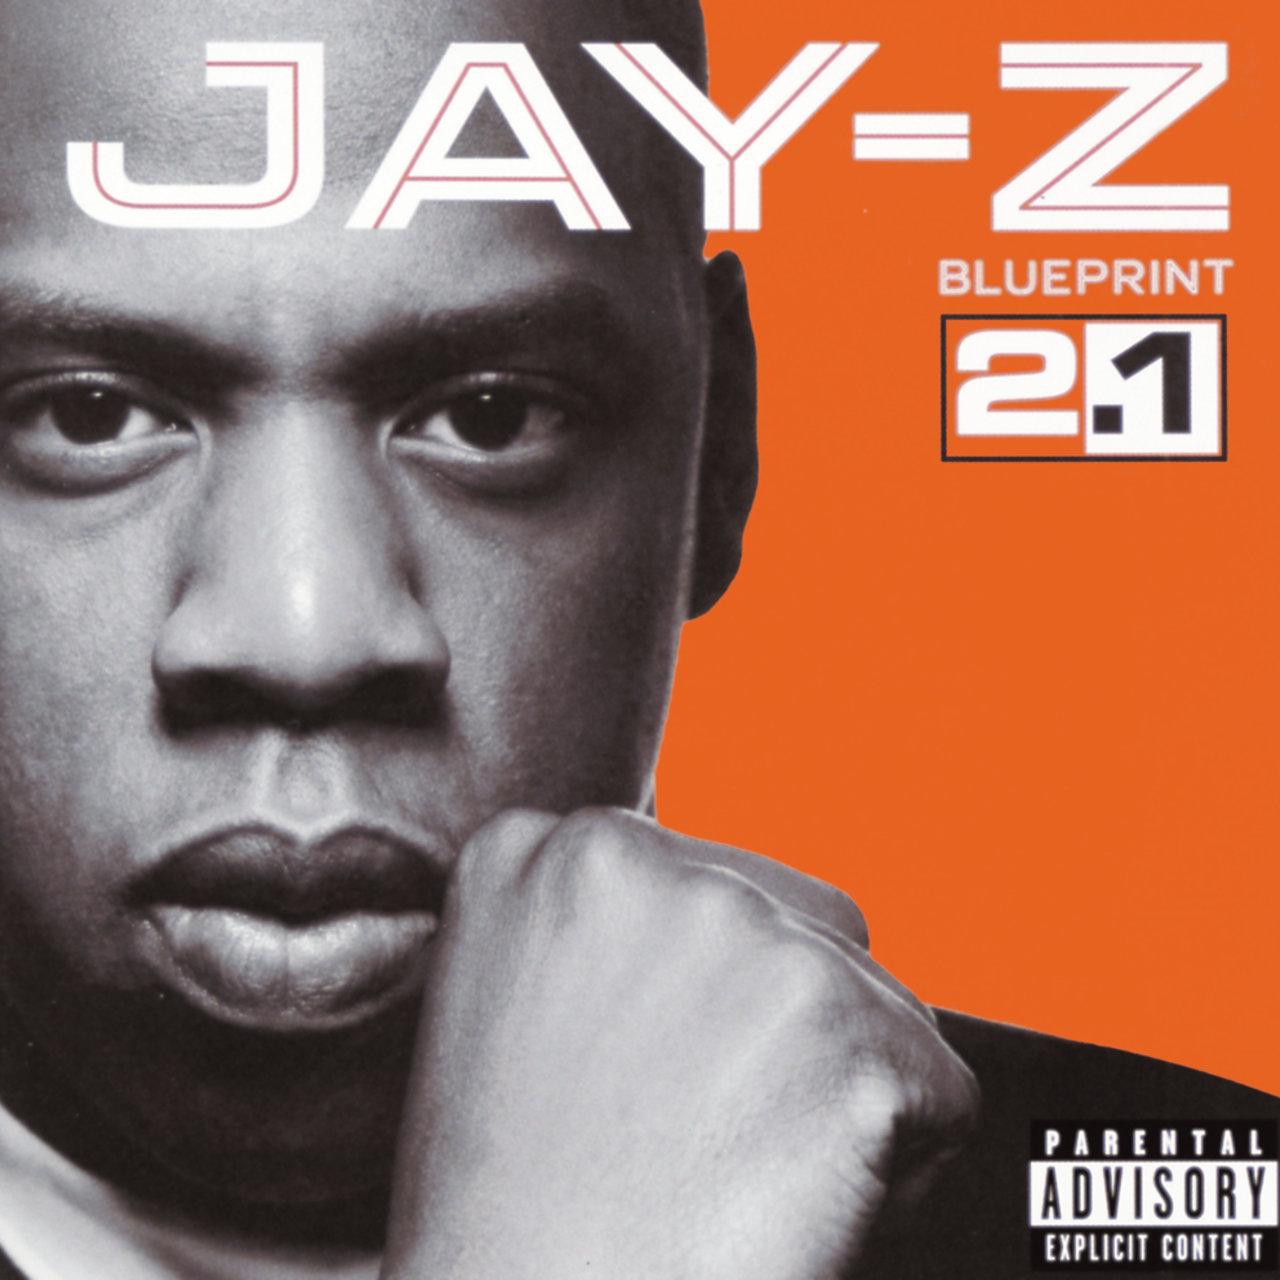 Jay-Z - Blueprint 2.1 (Cover)